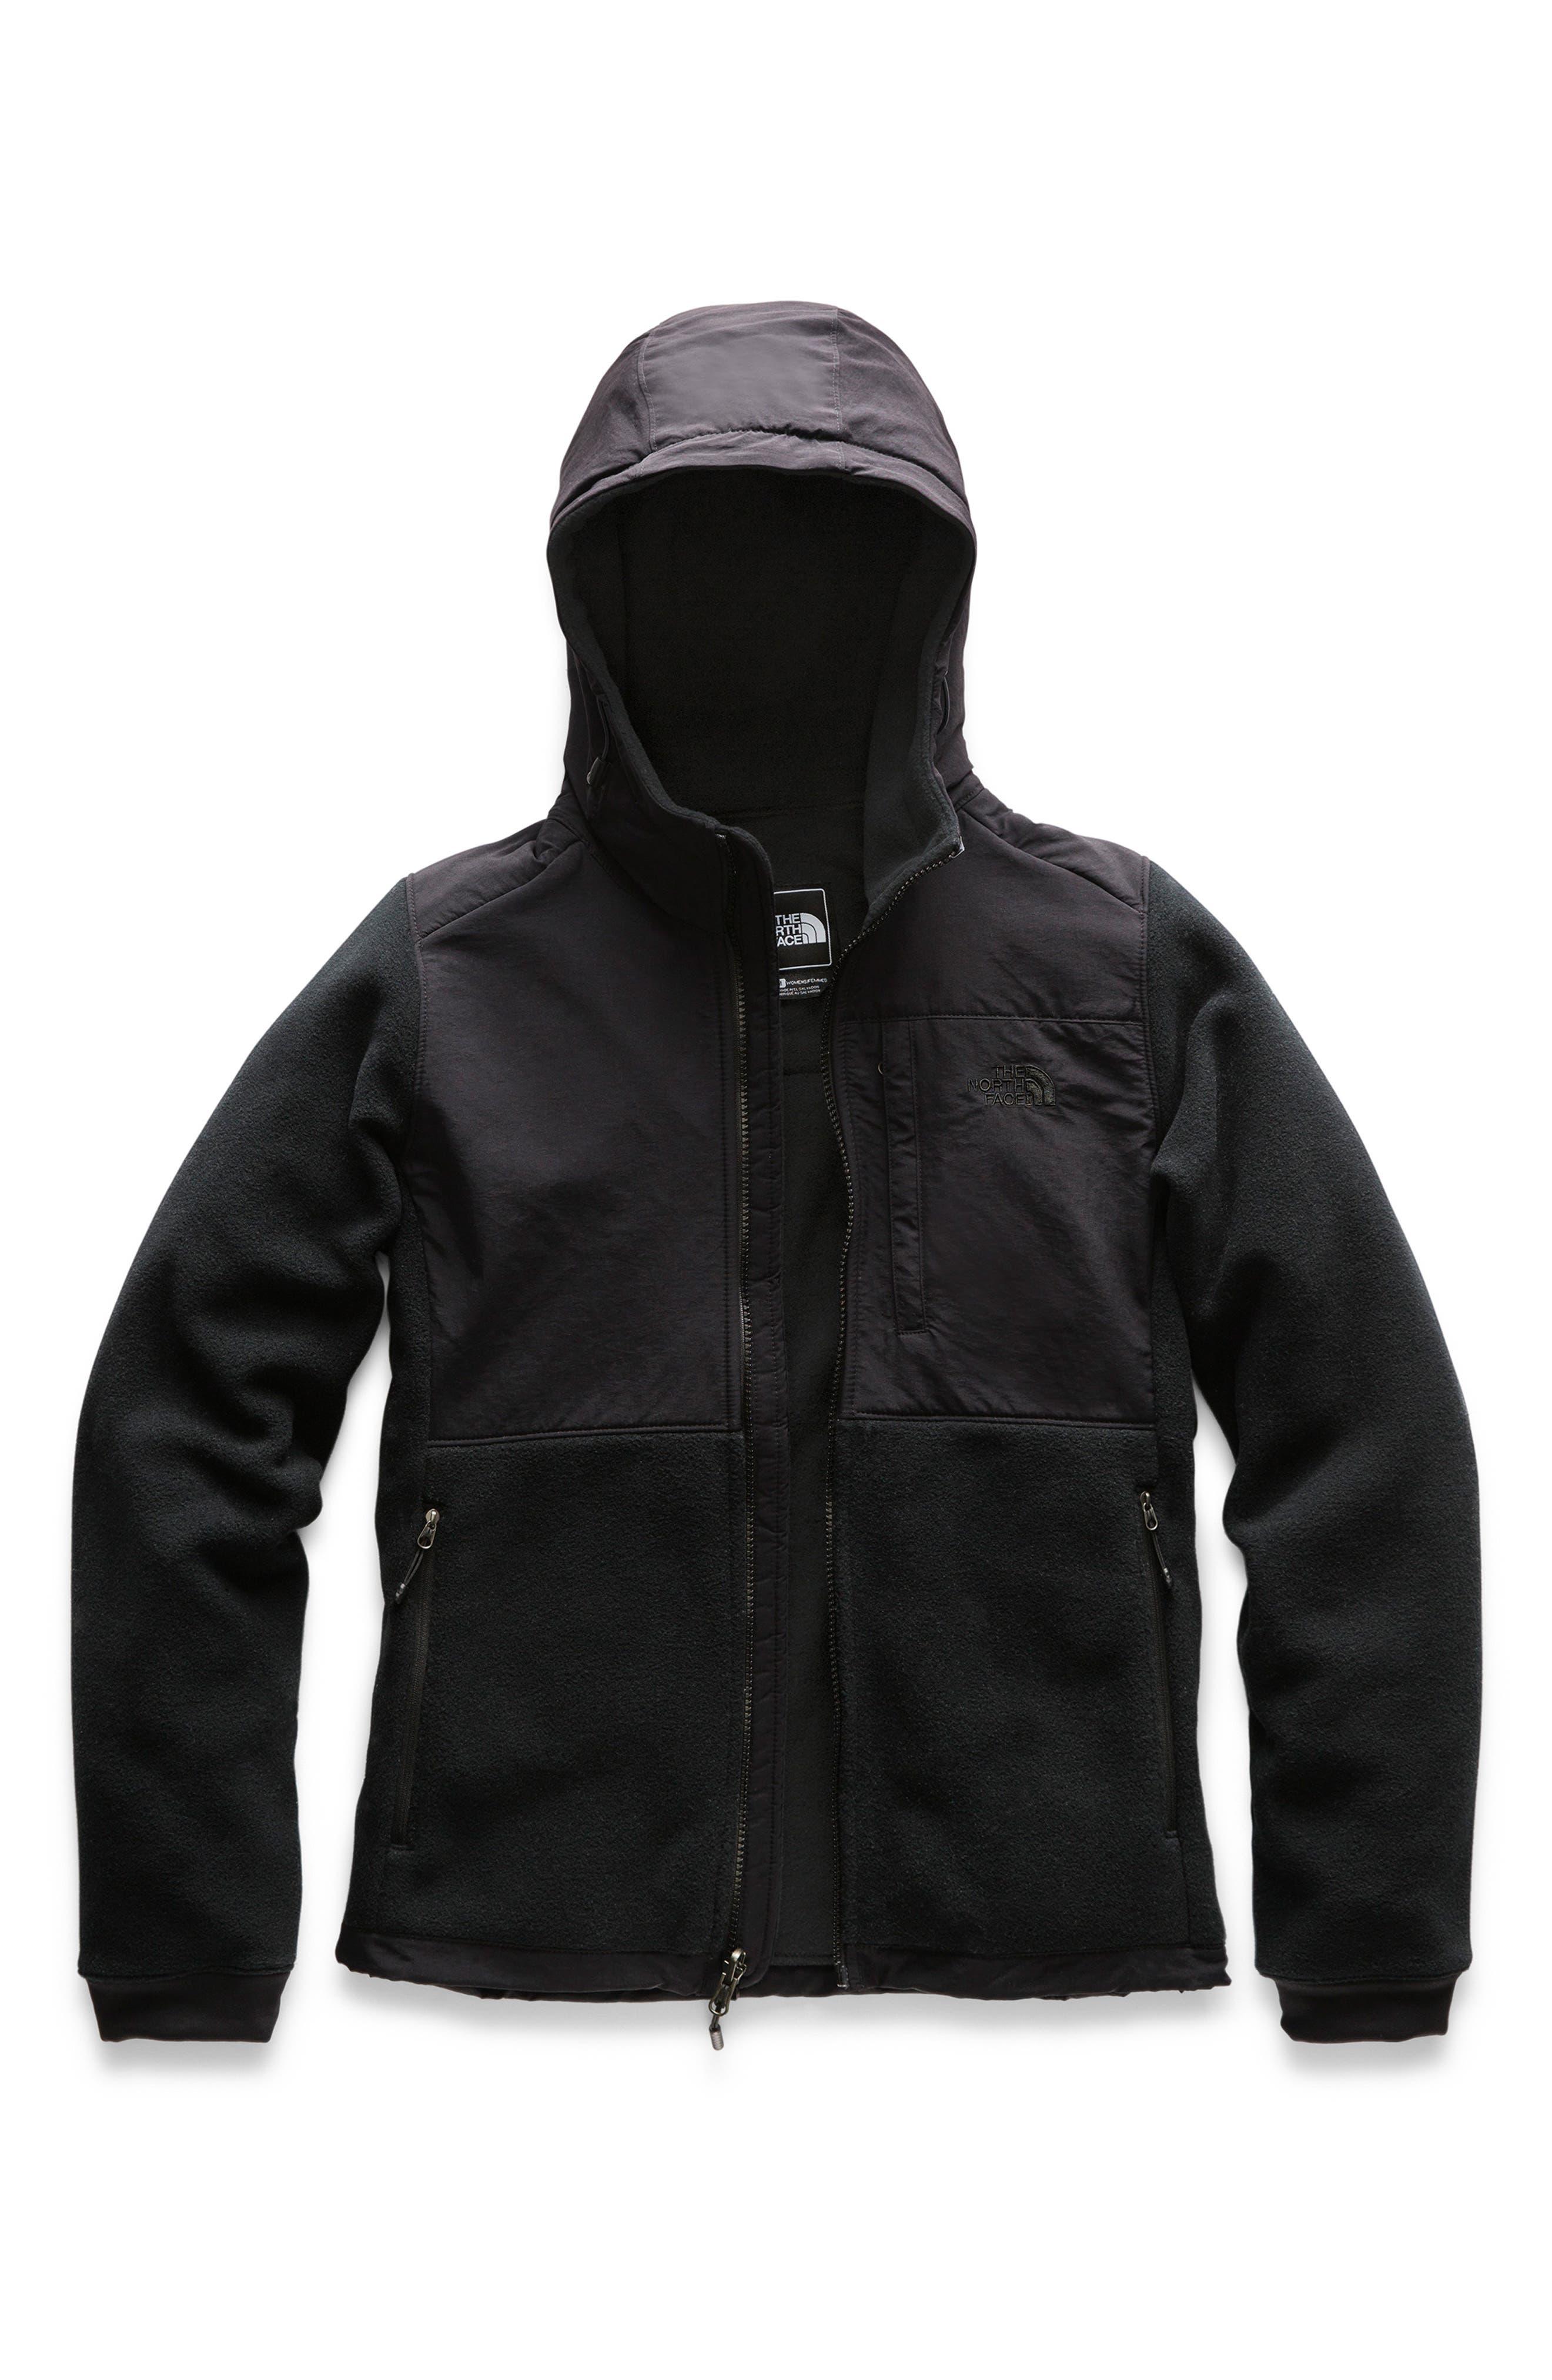 THE NORTH FACE Denali 2 Hooded Jacket, Main, color, 001